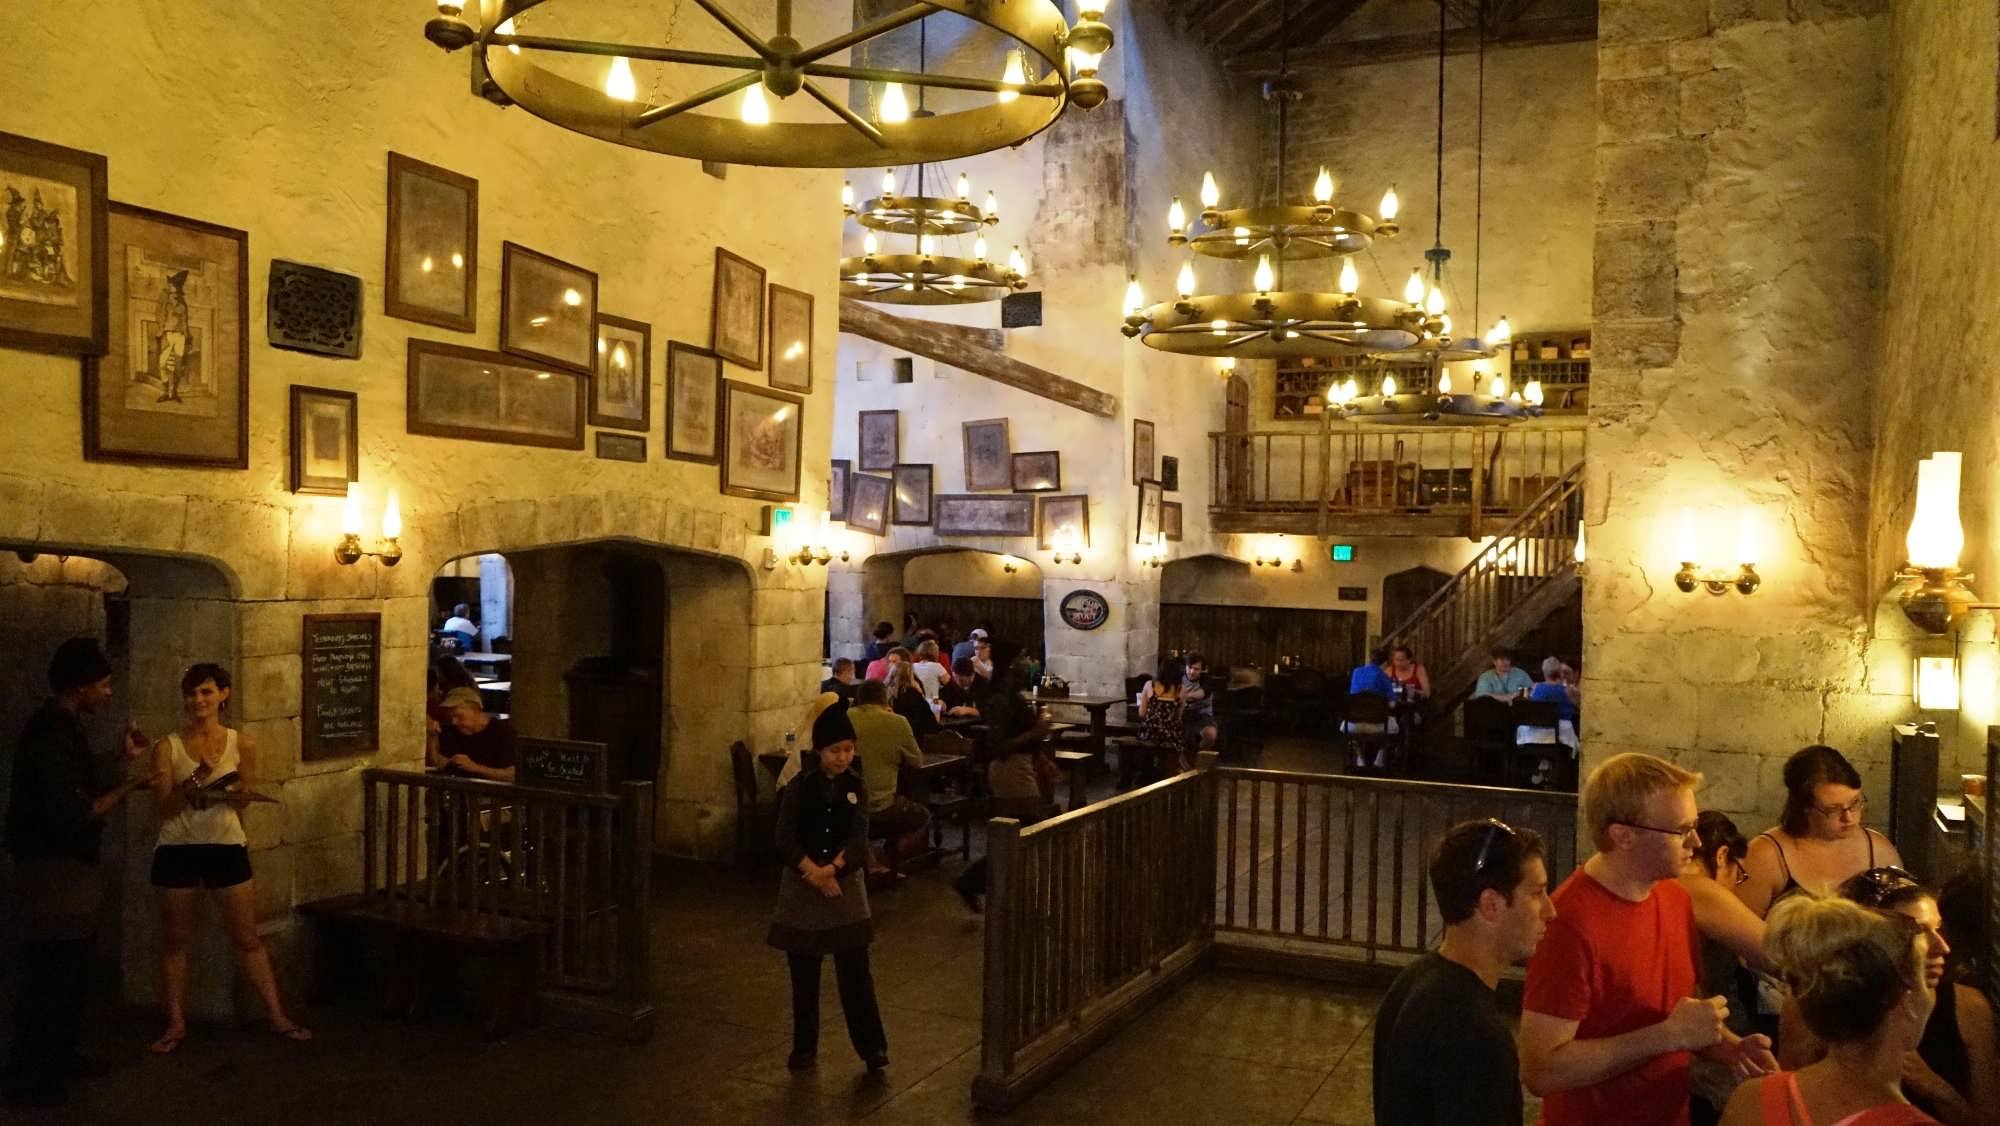 Interior of the Leaky Cauldron at Universal Studios Florida